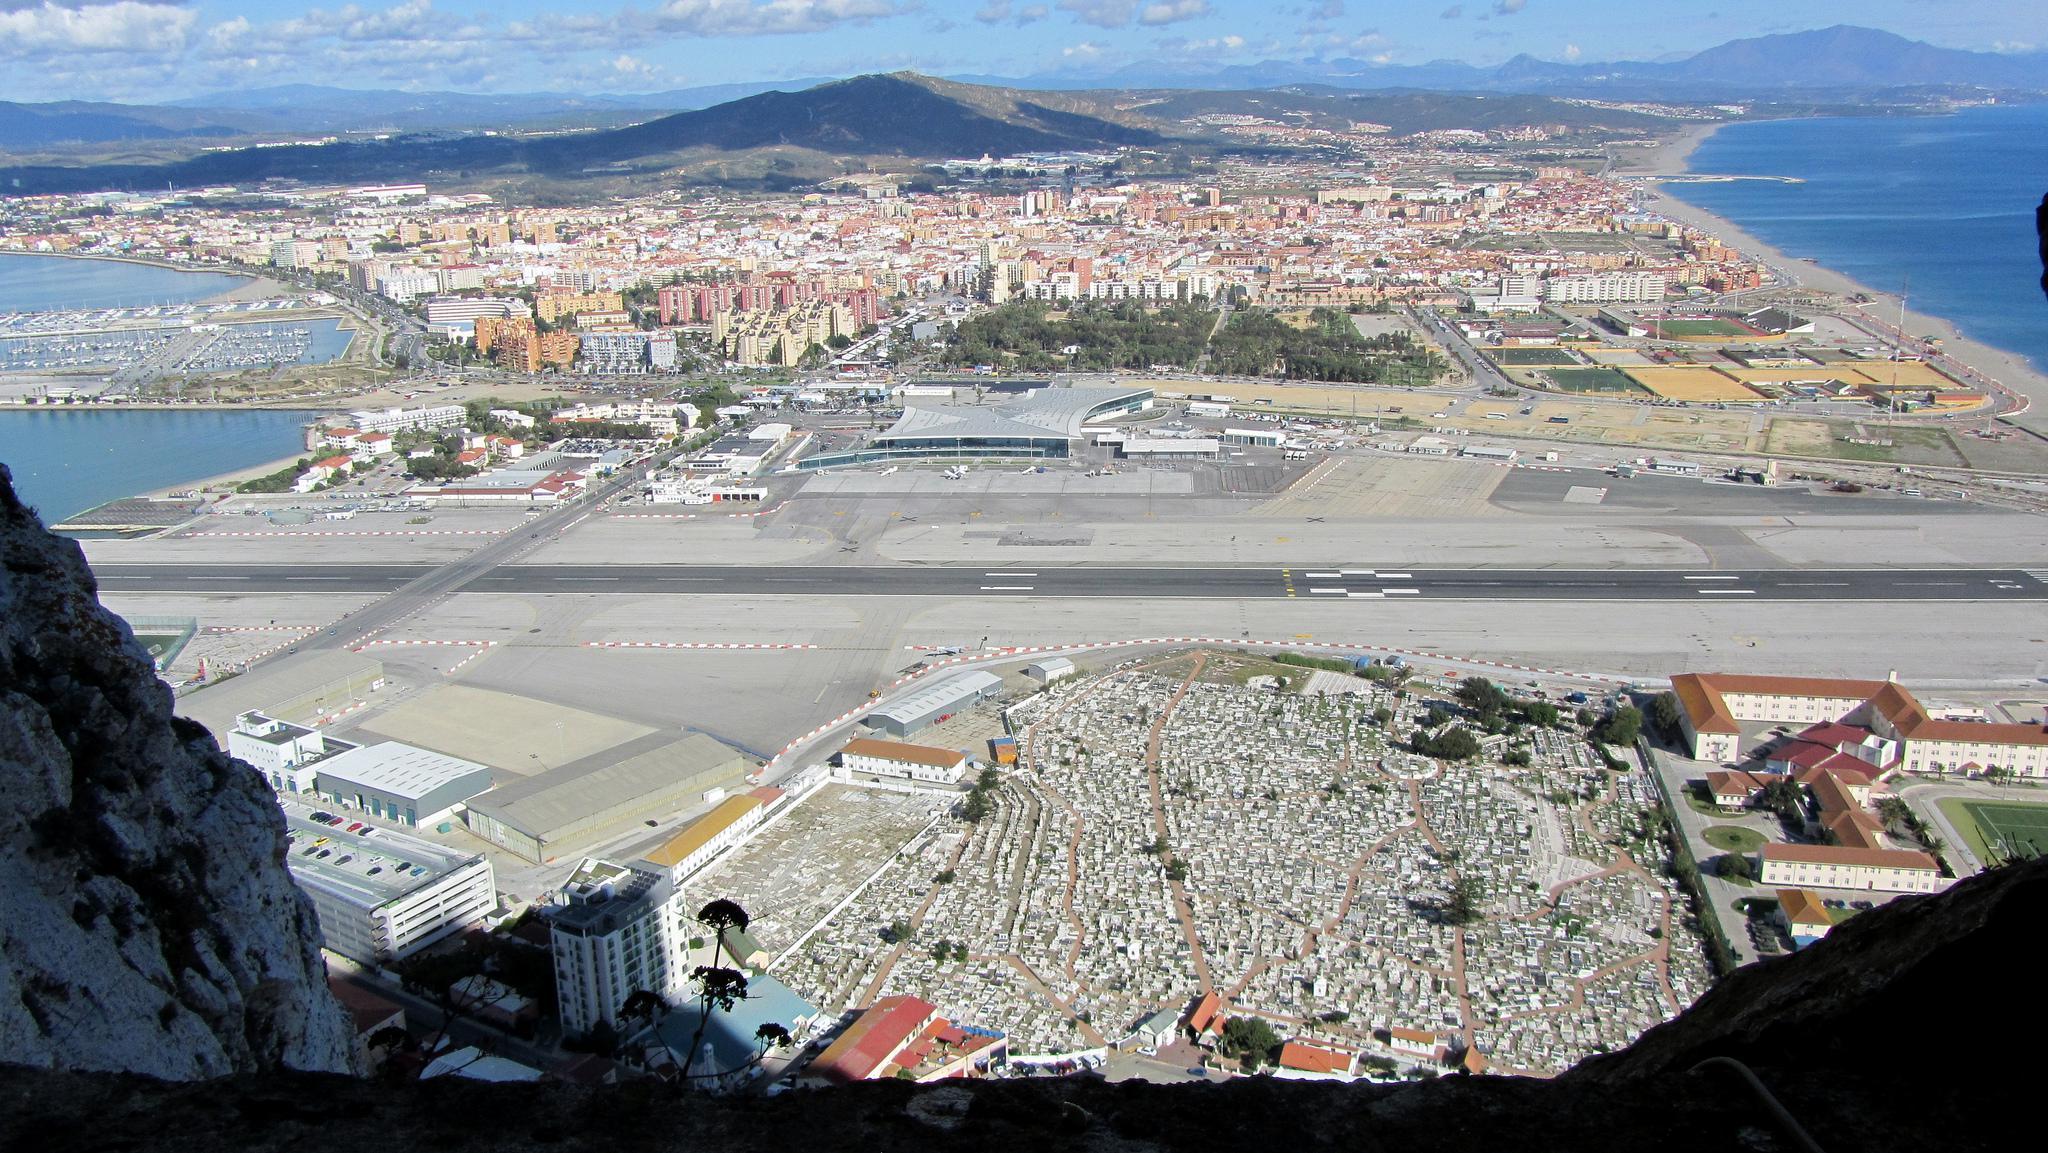 Gibraltar Airport. where a busy road runs through the runway